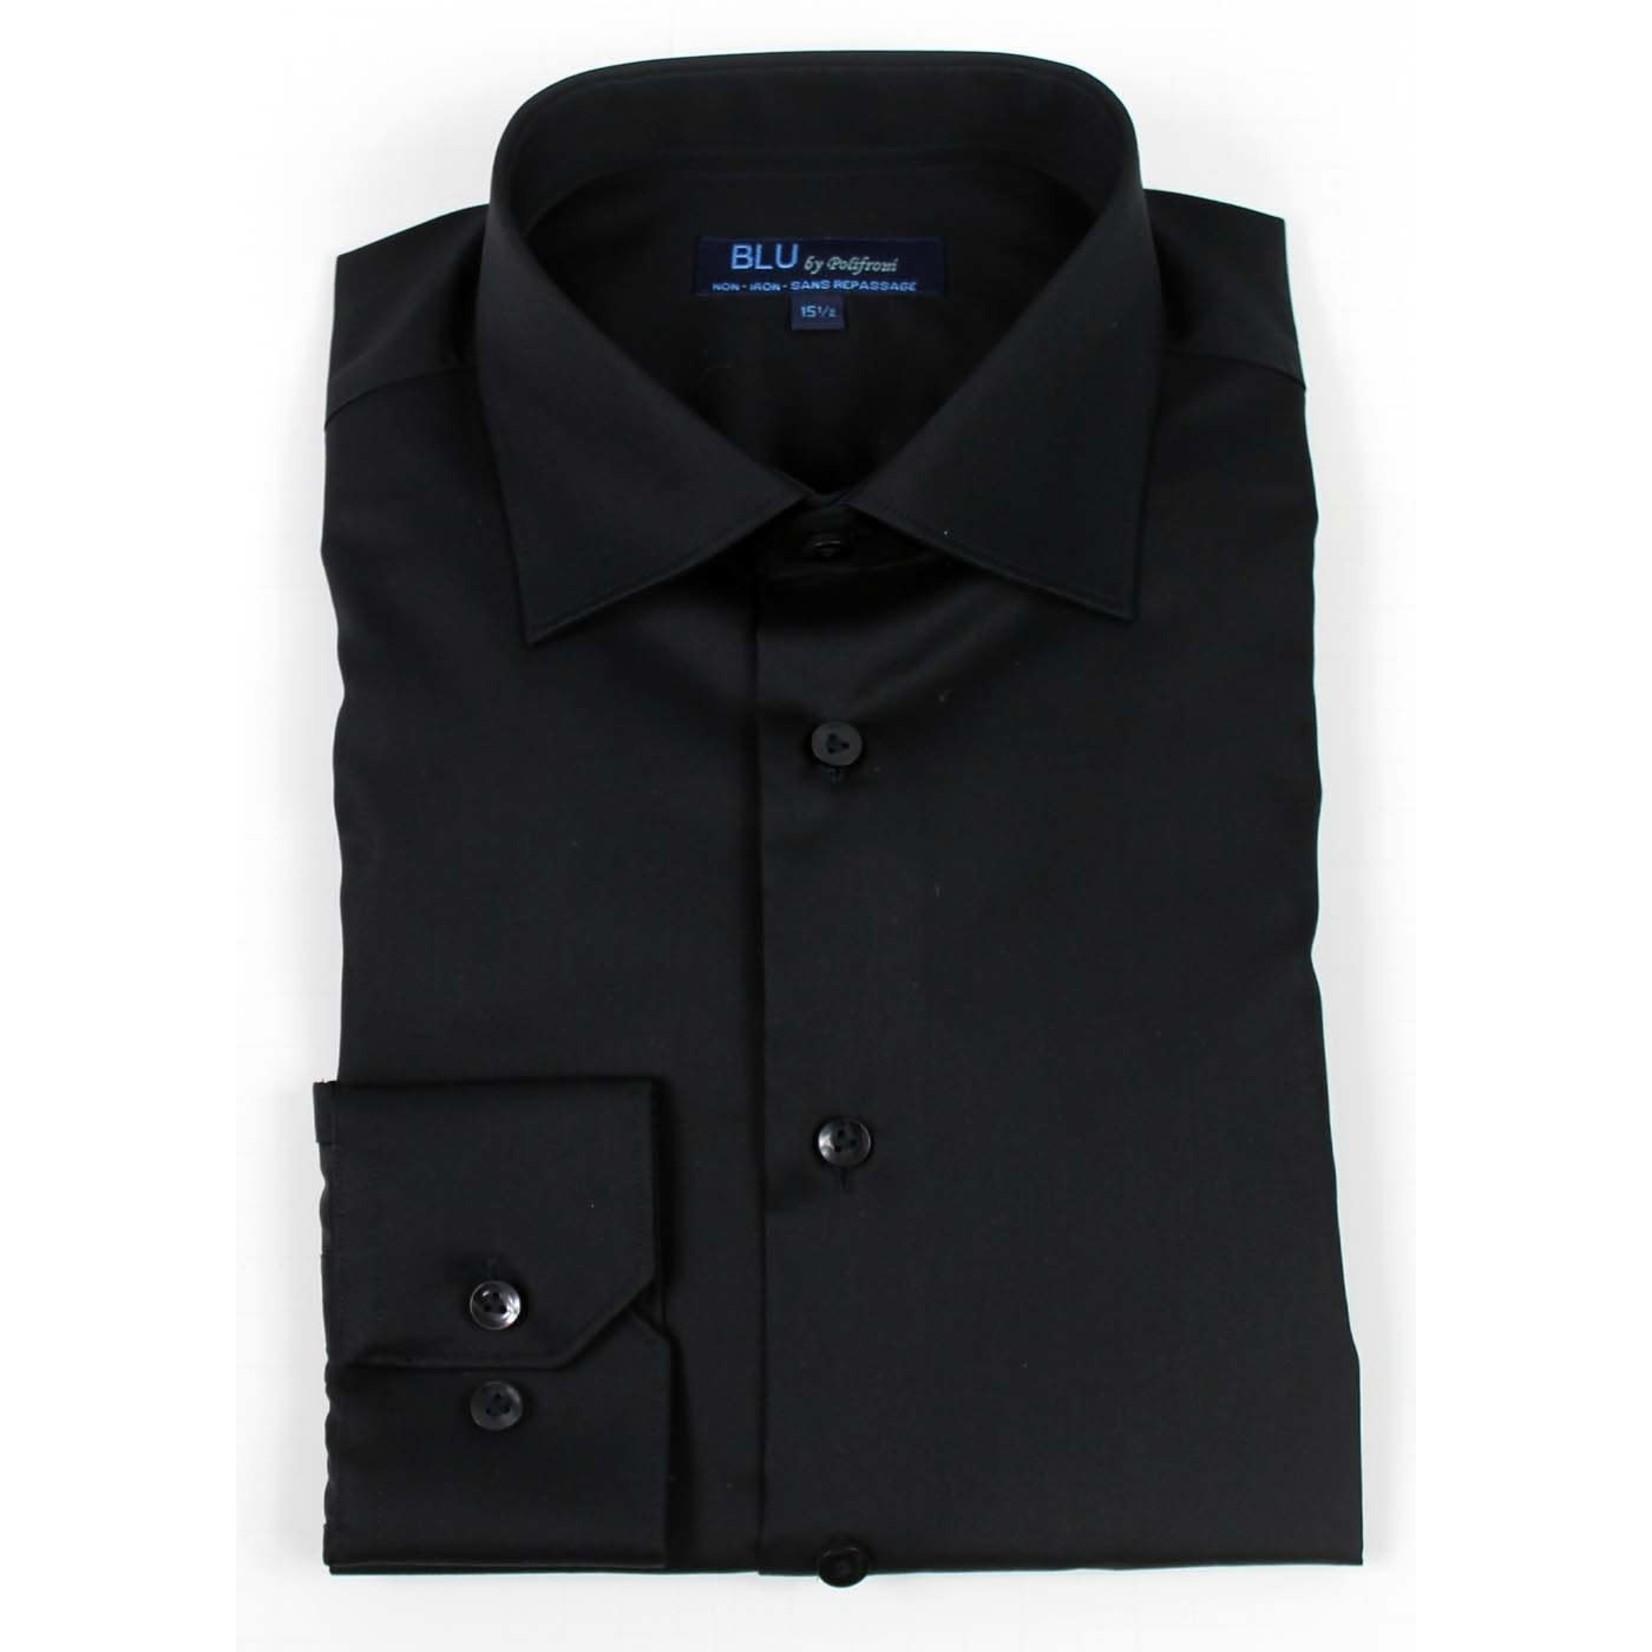 Polifroni Blu-360M Miami Non-Iron Dress Shirt 99 Black